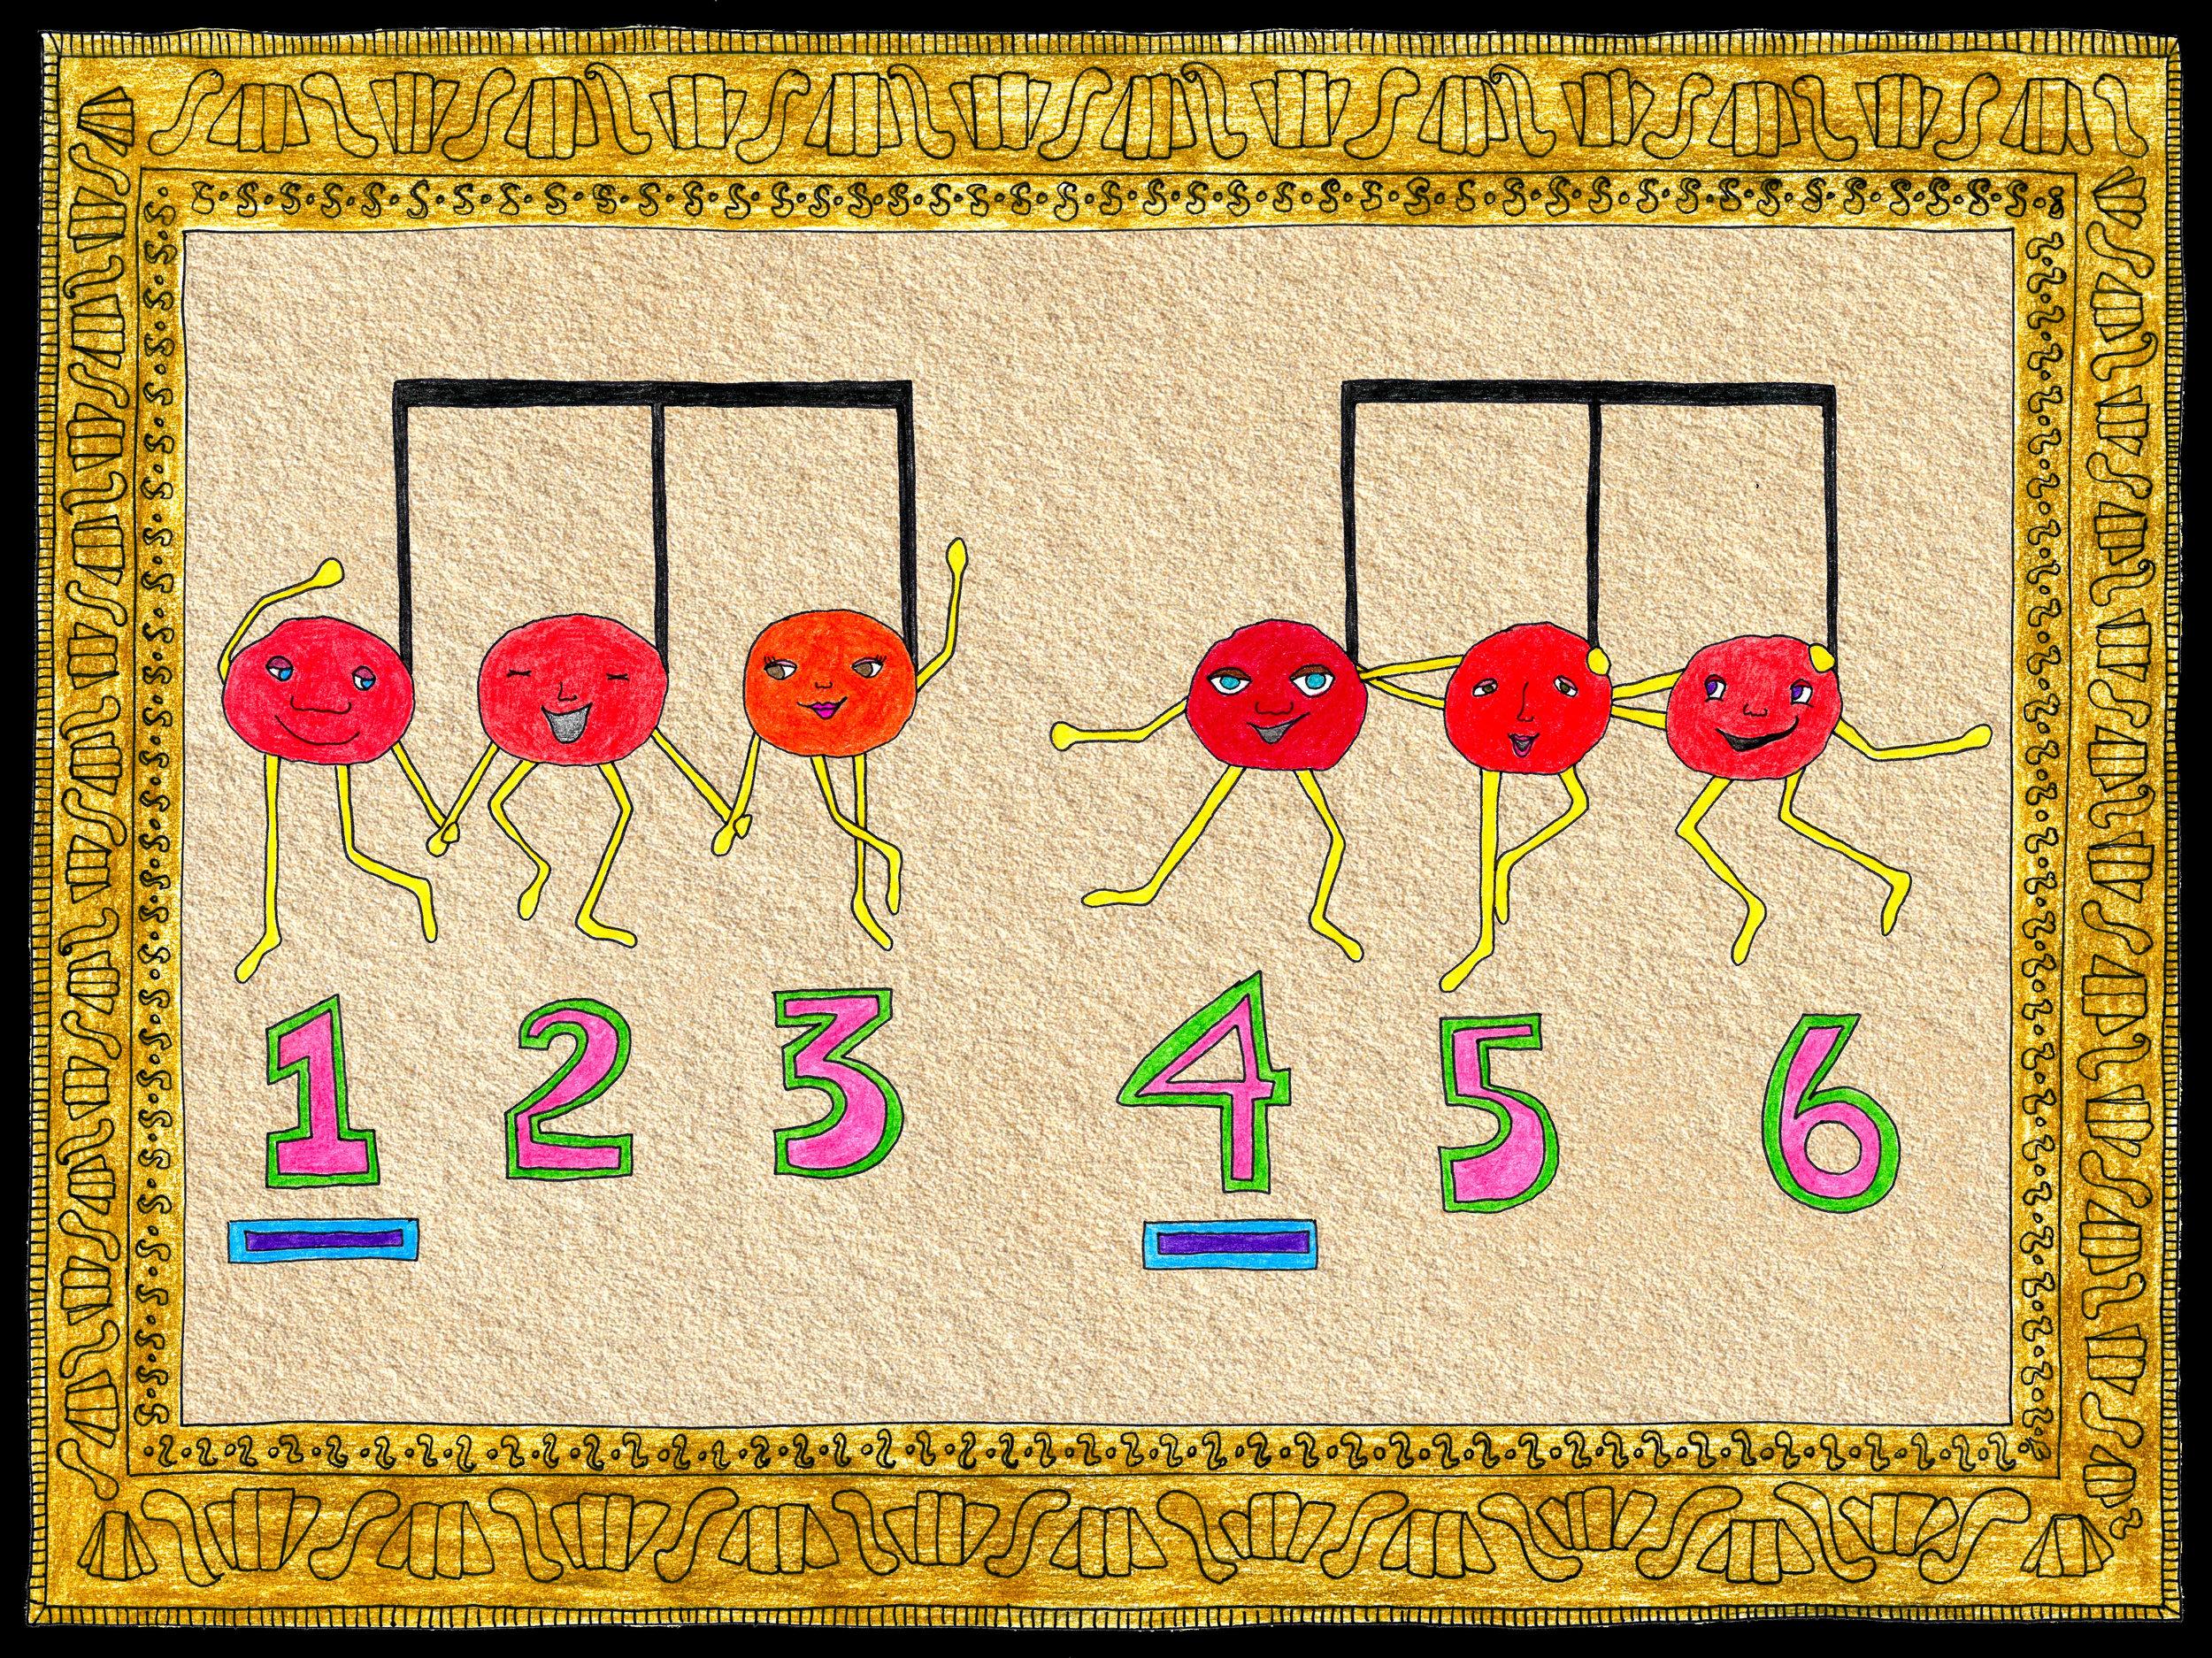 40b 6 notes 33.jpg